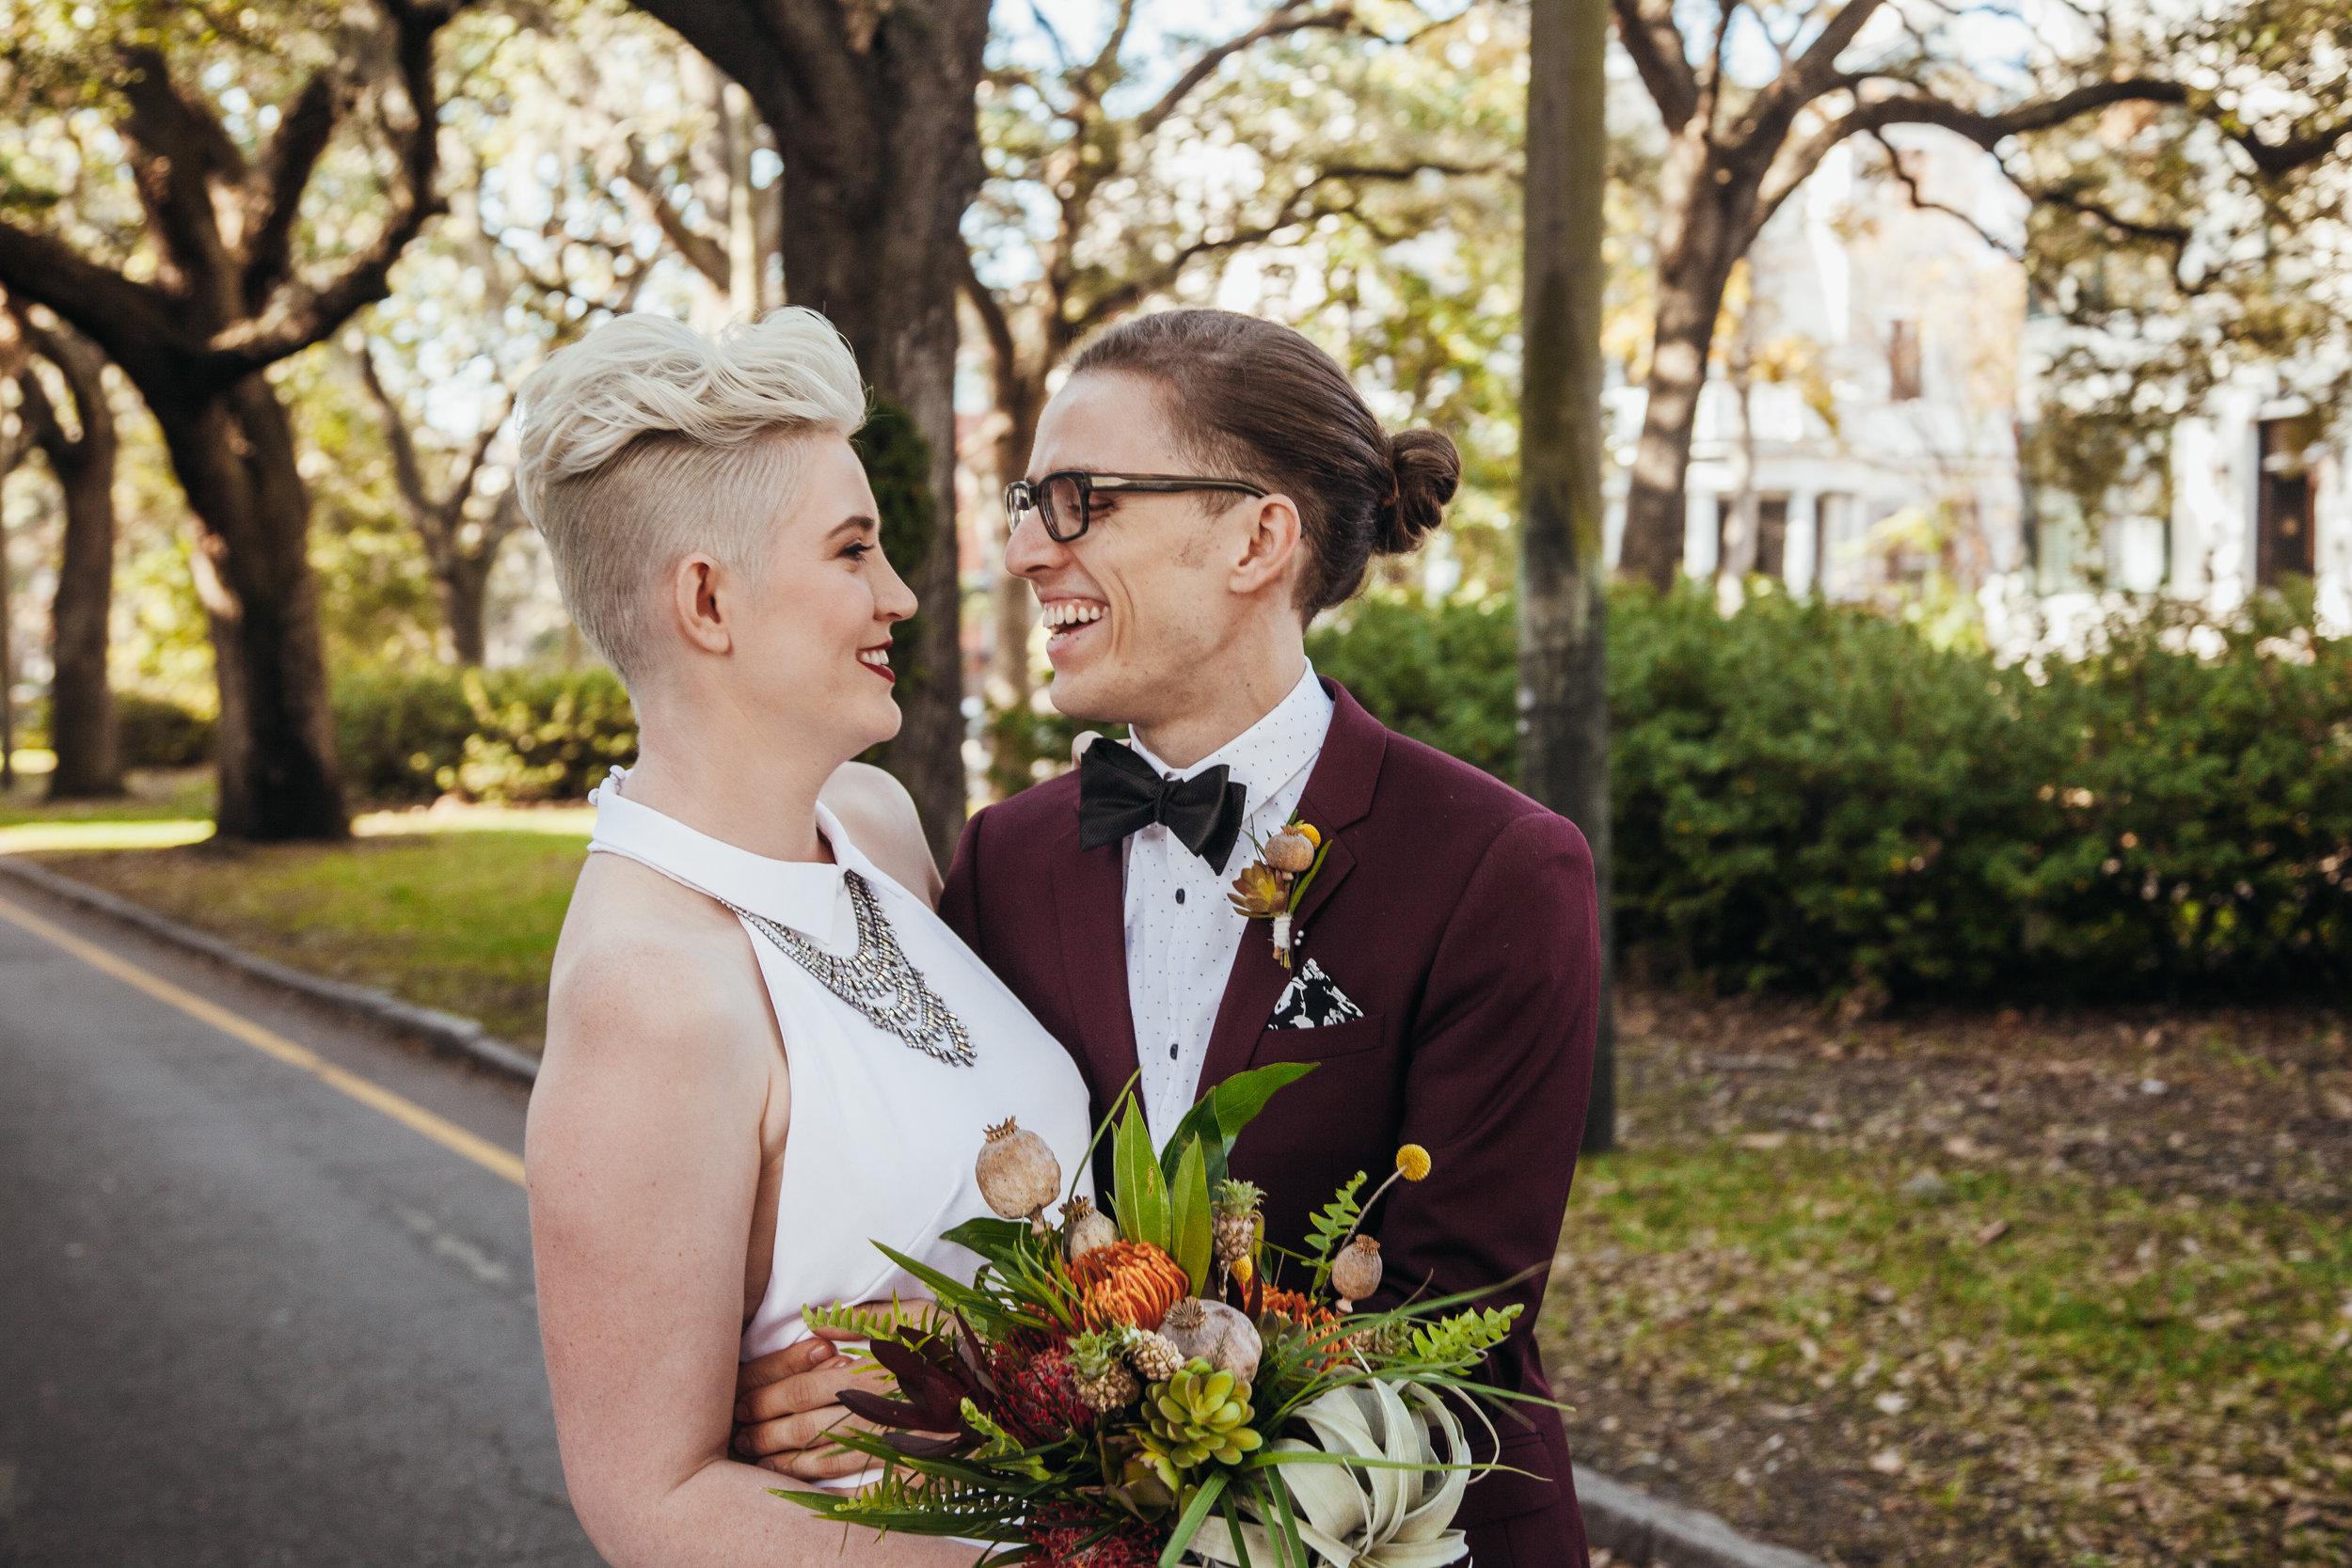 julia-hembree-photography-eden-village-church-wedding-savannah-warehouse-wedding-ivory-and-beau-bridal-boutique-savannah-florist-savannah-wedding-planner-savannah-event-design-scad-wedding-artist-wedding-savannah-funky-wedding-handmade-wedding-30.jpg